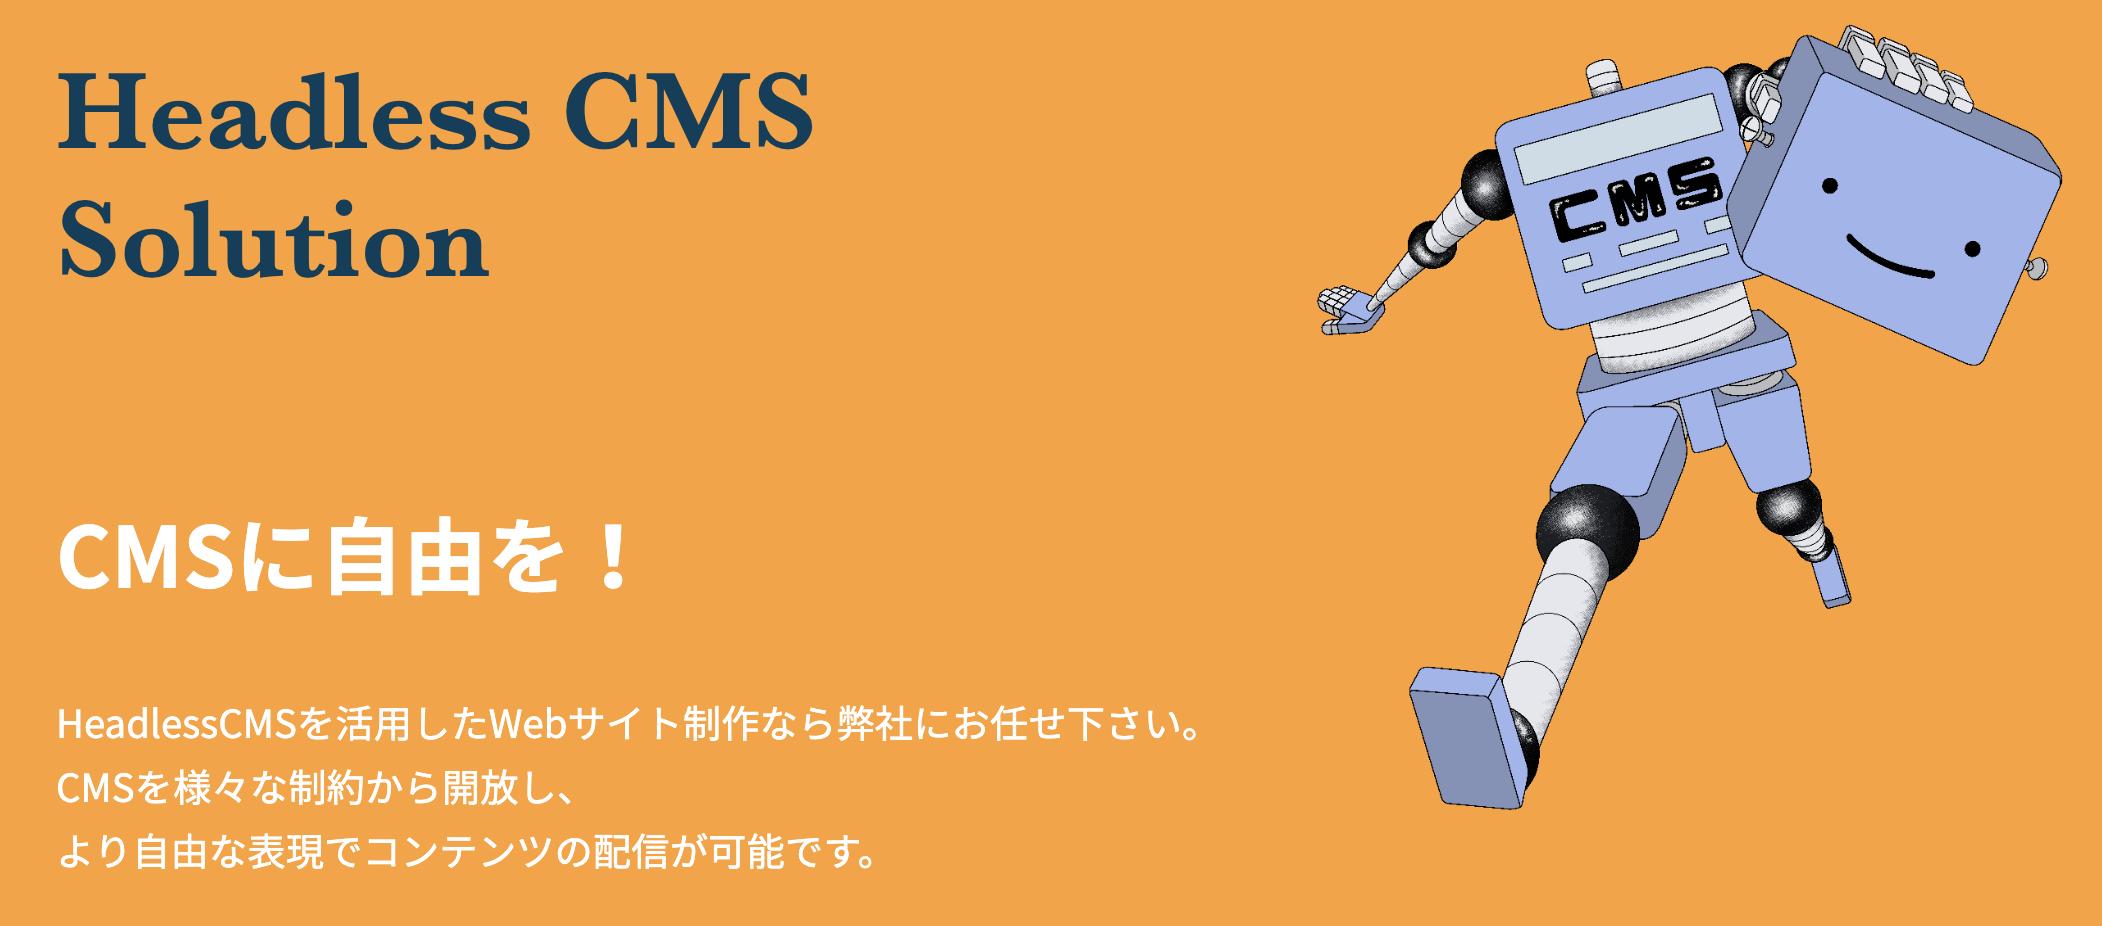 Headless CMS Solution